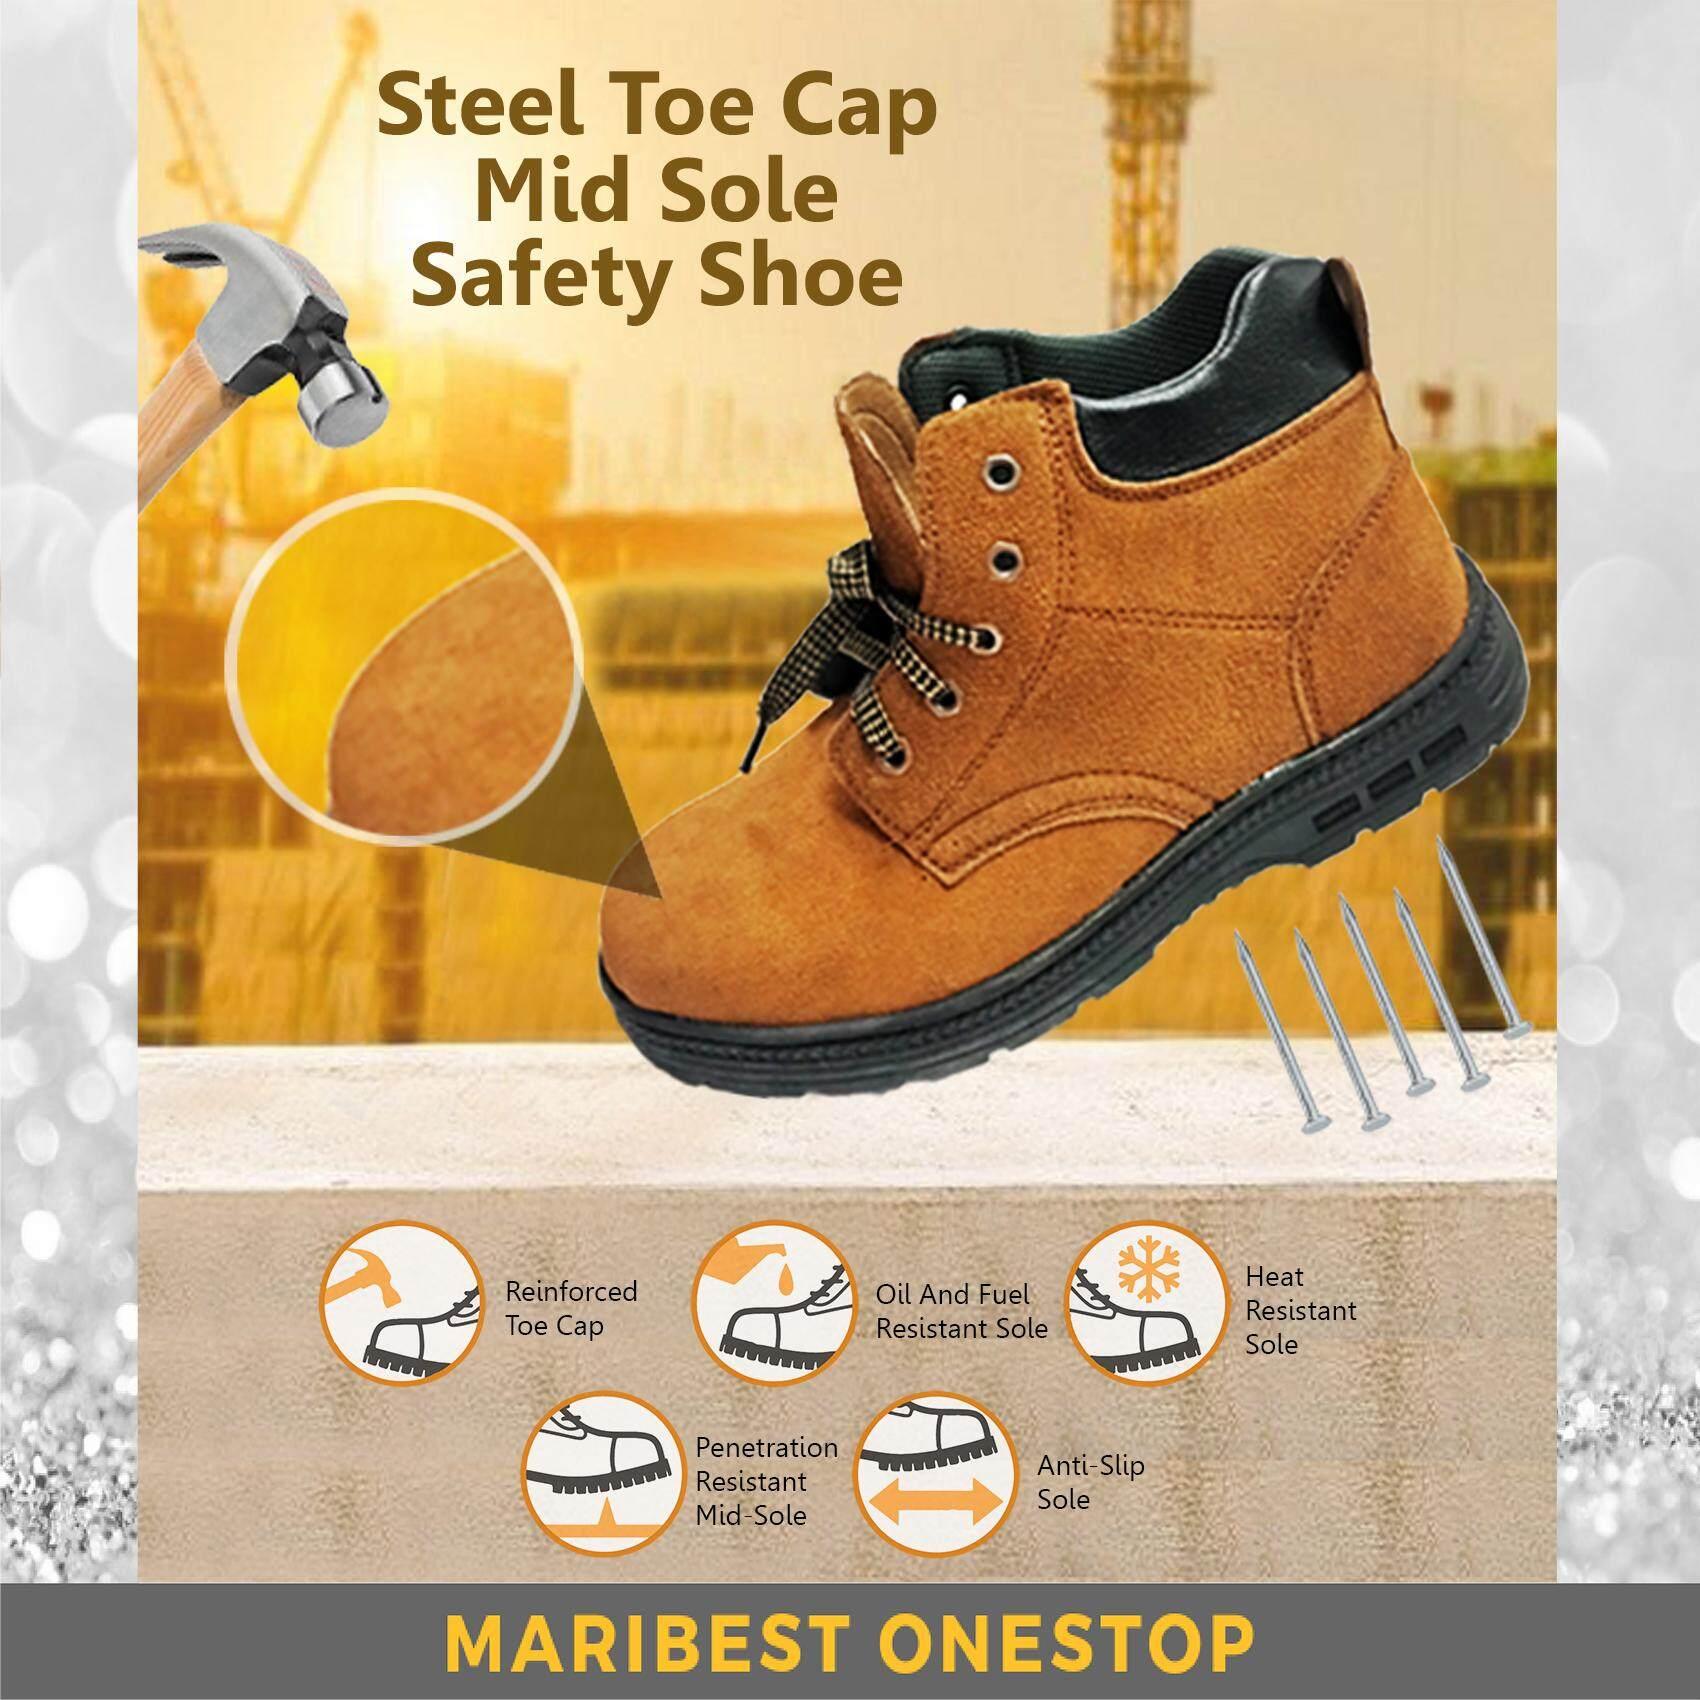 Safety Shoe Steel Toe Cap Mid Sole Medium Cut Brown